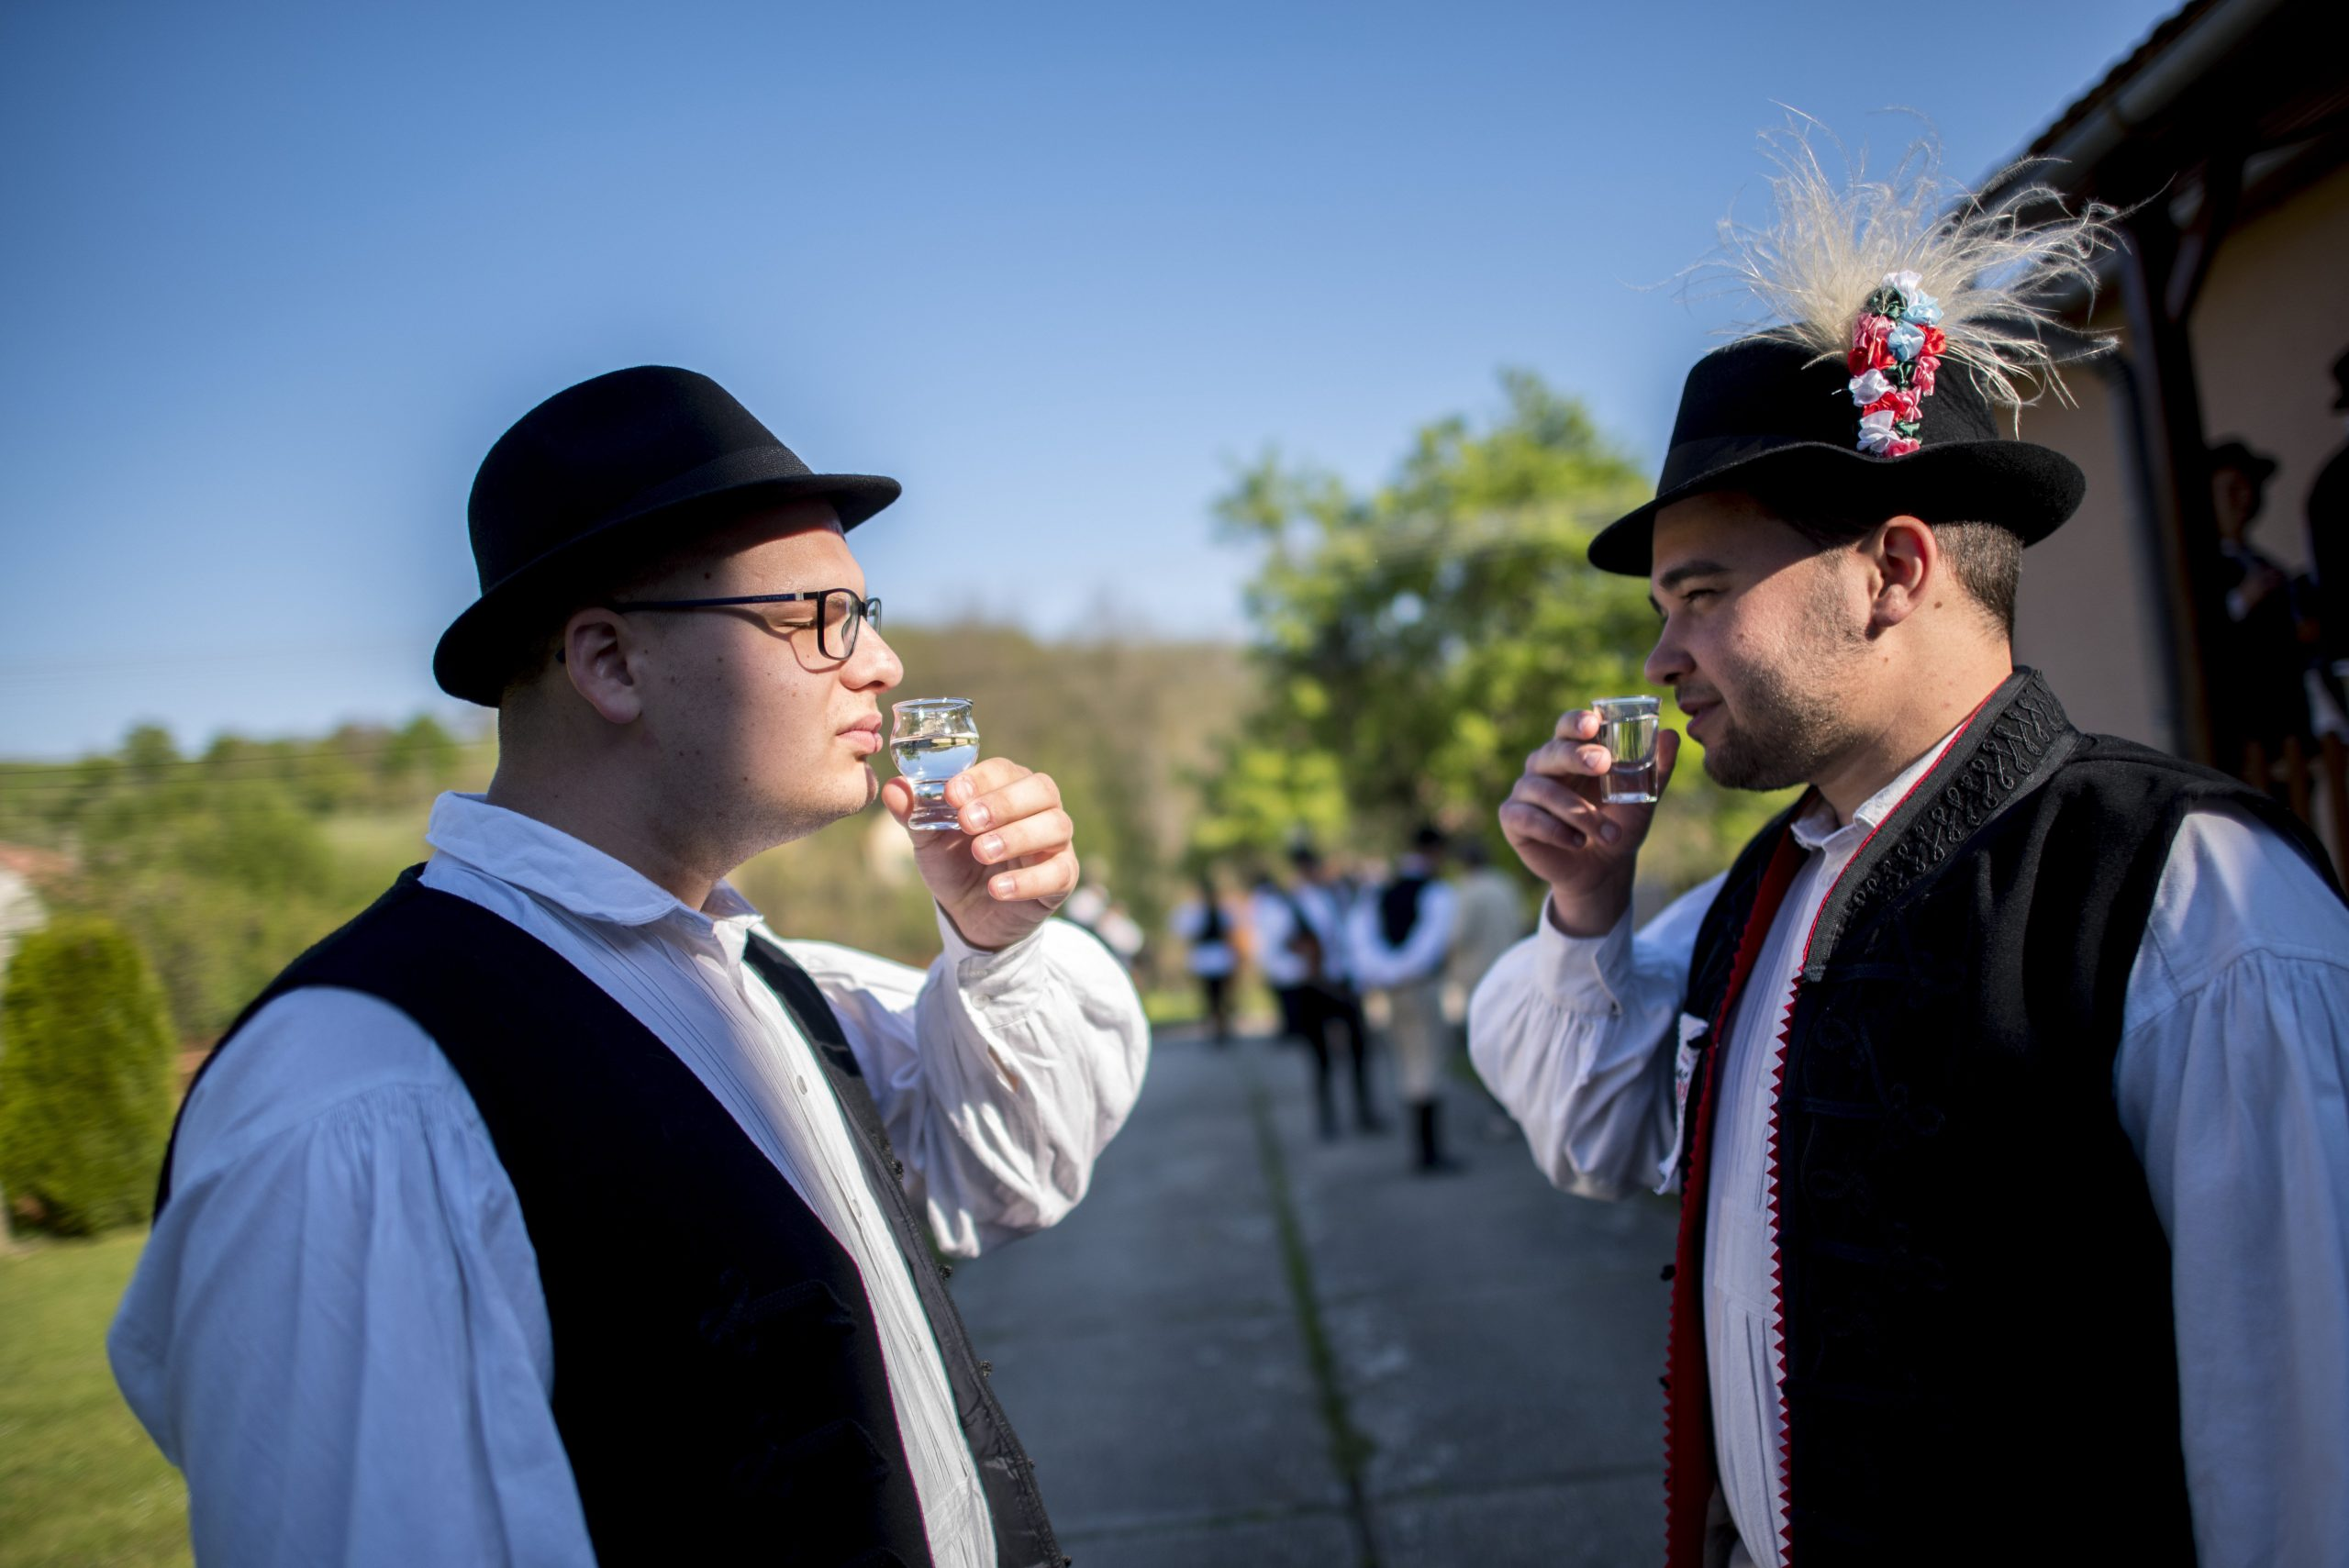 Hungary Wins 'Pálinka War': EU Allows Tax-free Fruit Distillate for Household Consumption